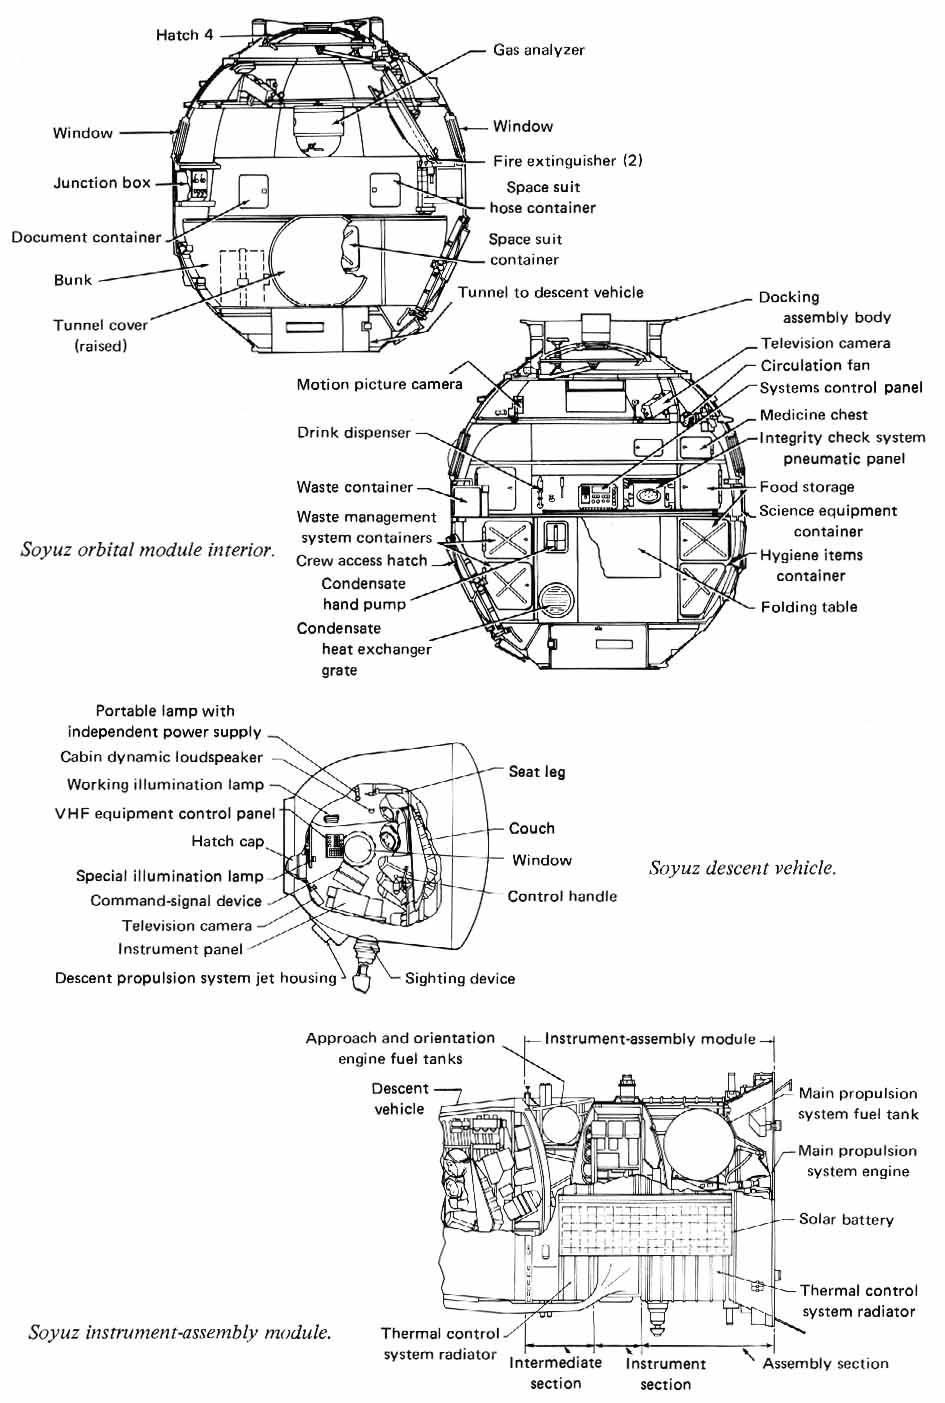 hight resolution of diagram of a 7k engine captain source of wiring diagram u2022 az toyota engine diagram of a 7k engine